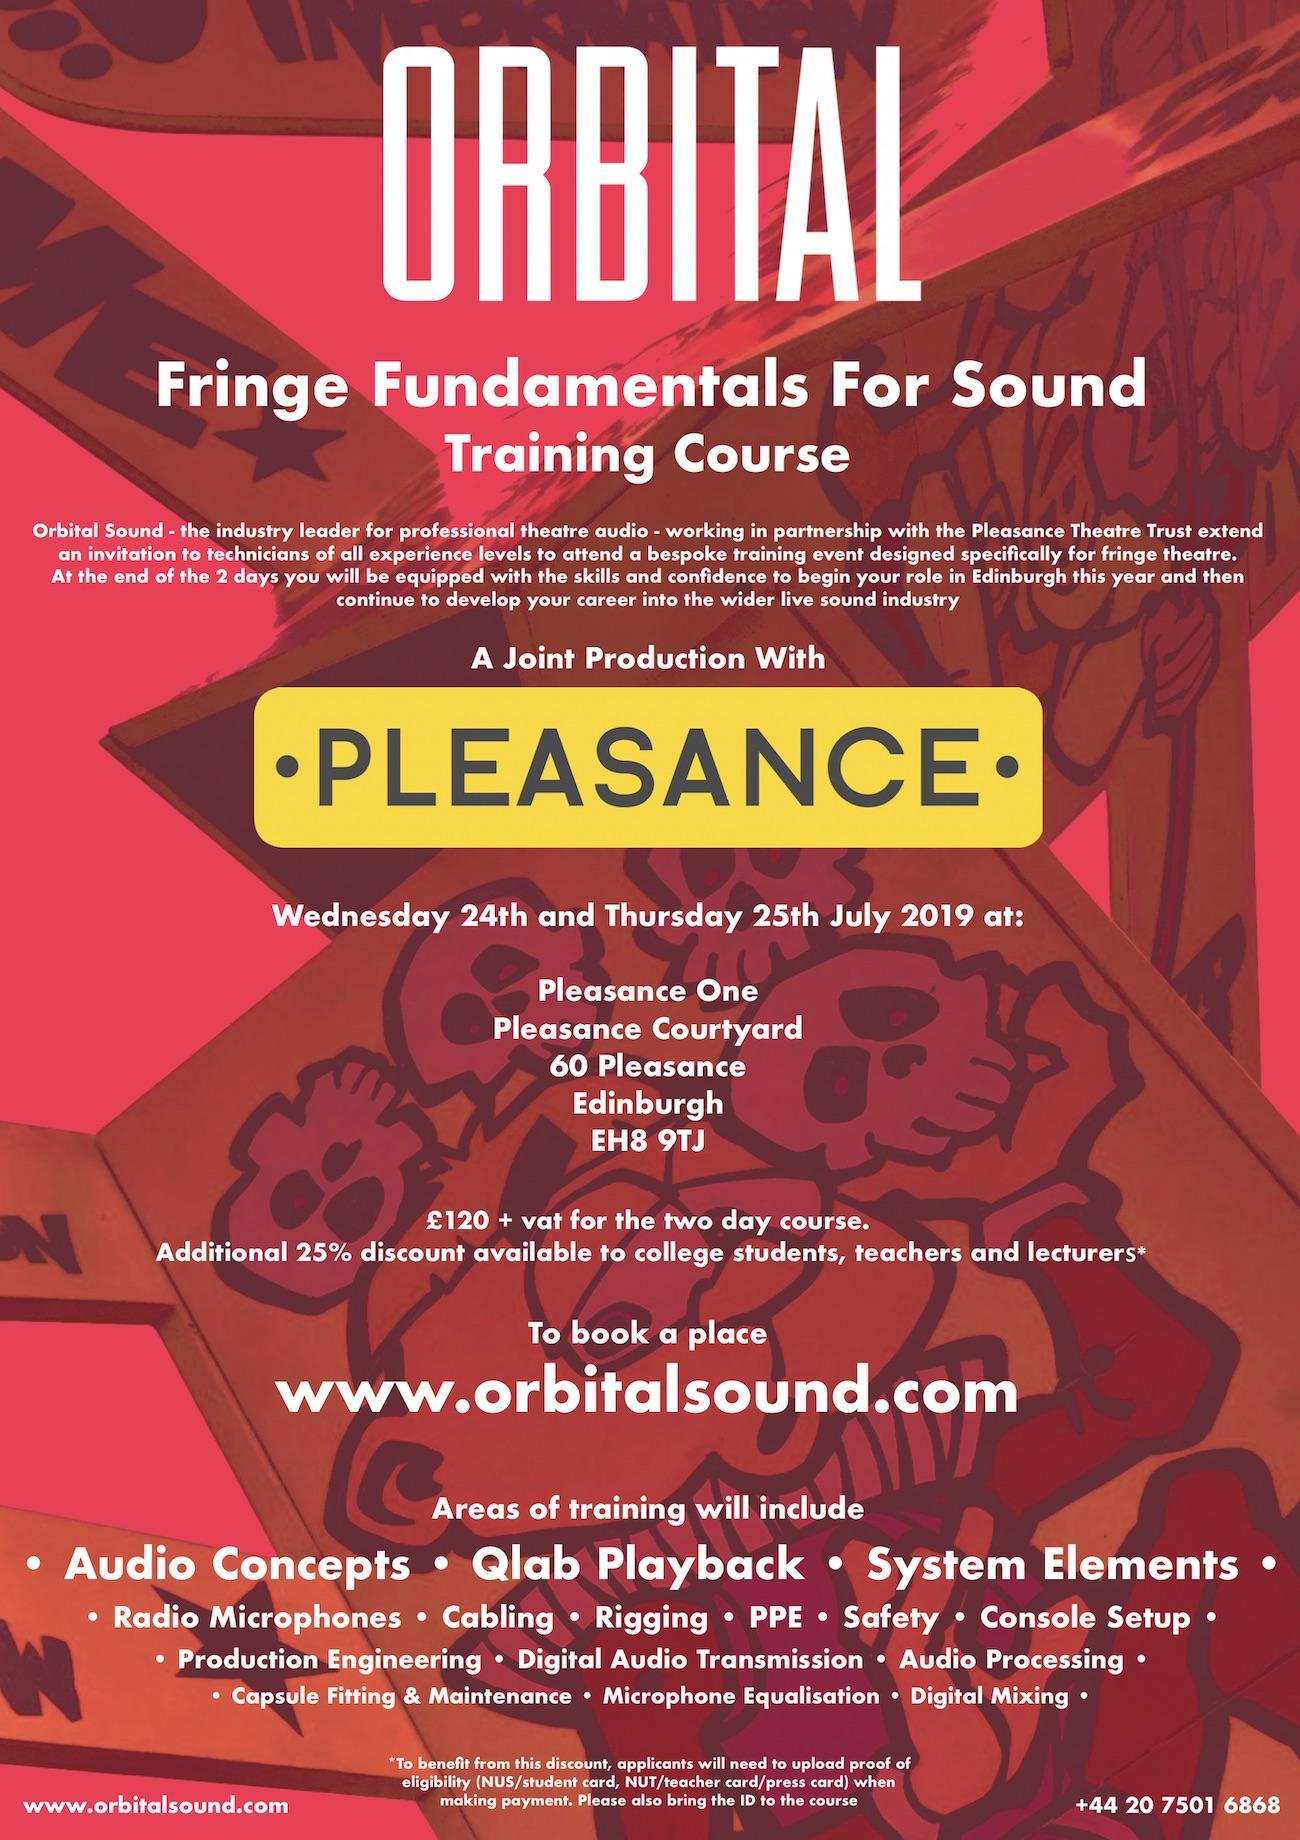 Fringe Fundamentals For Sound - Edinburgh Edition - Orbital